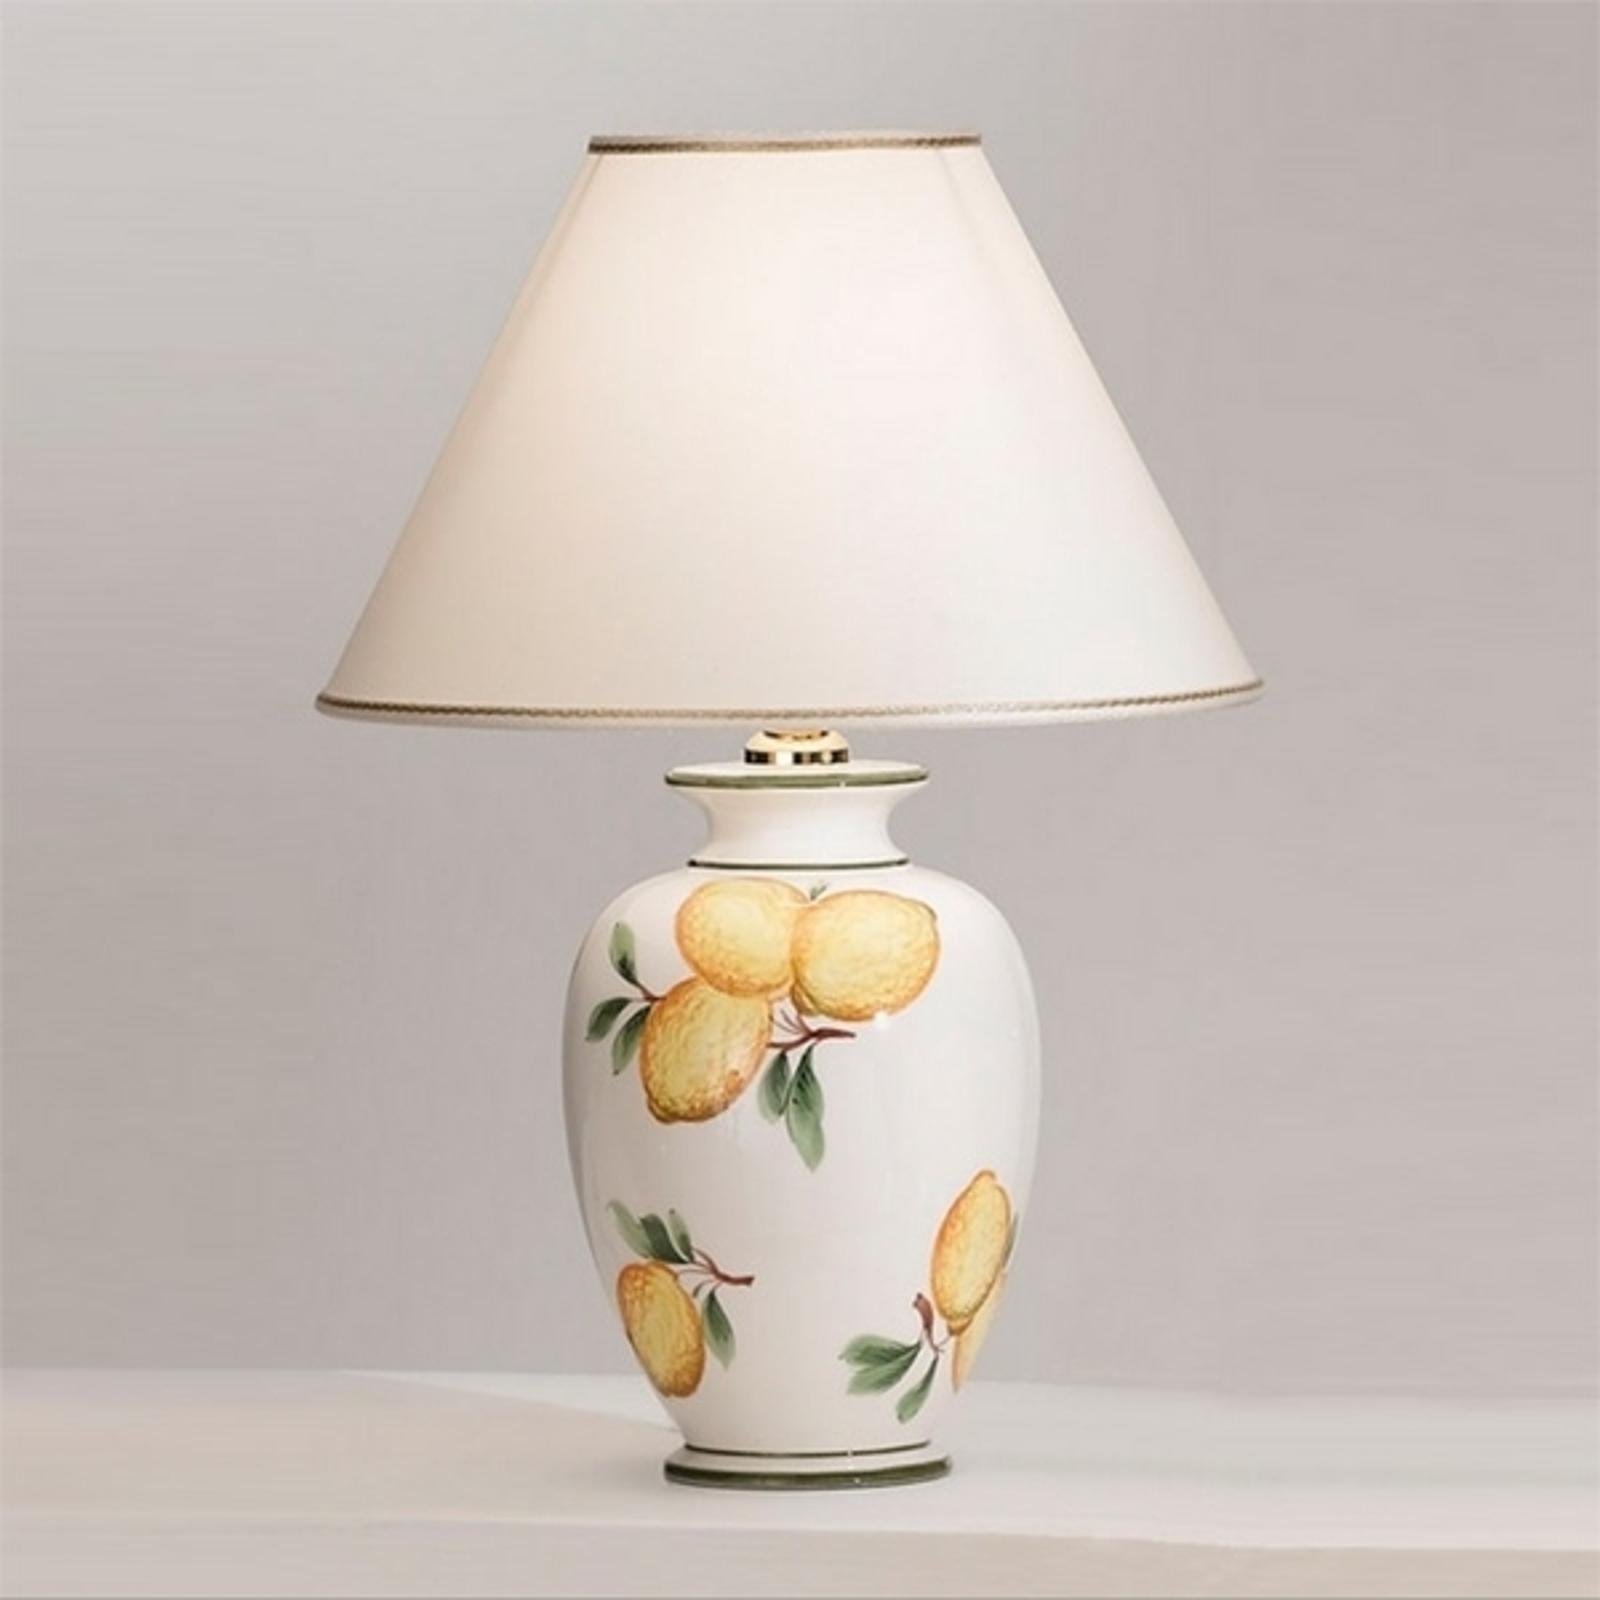 Lampada da tavolo Giardino Lemone, Ø 30 cm